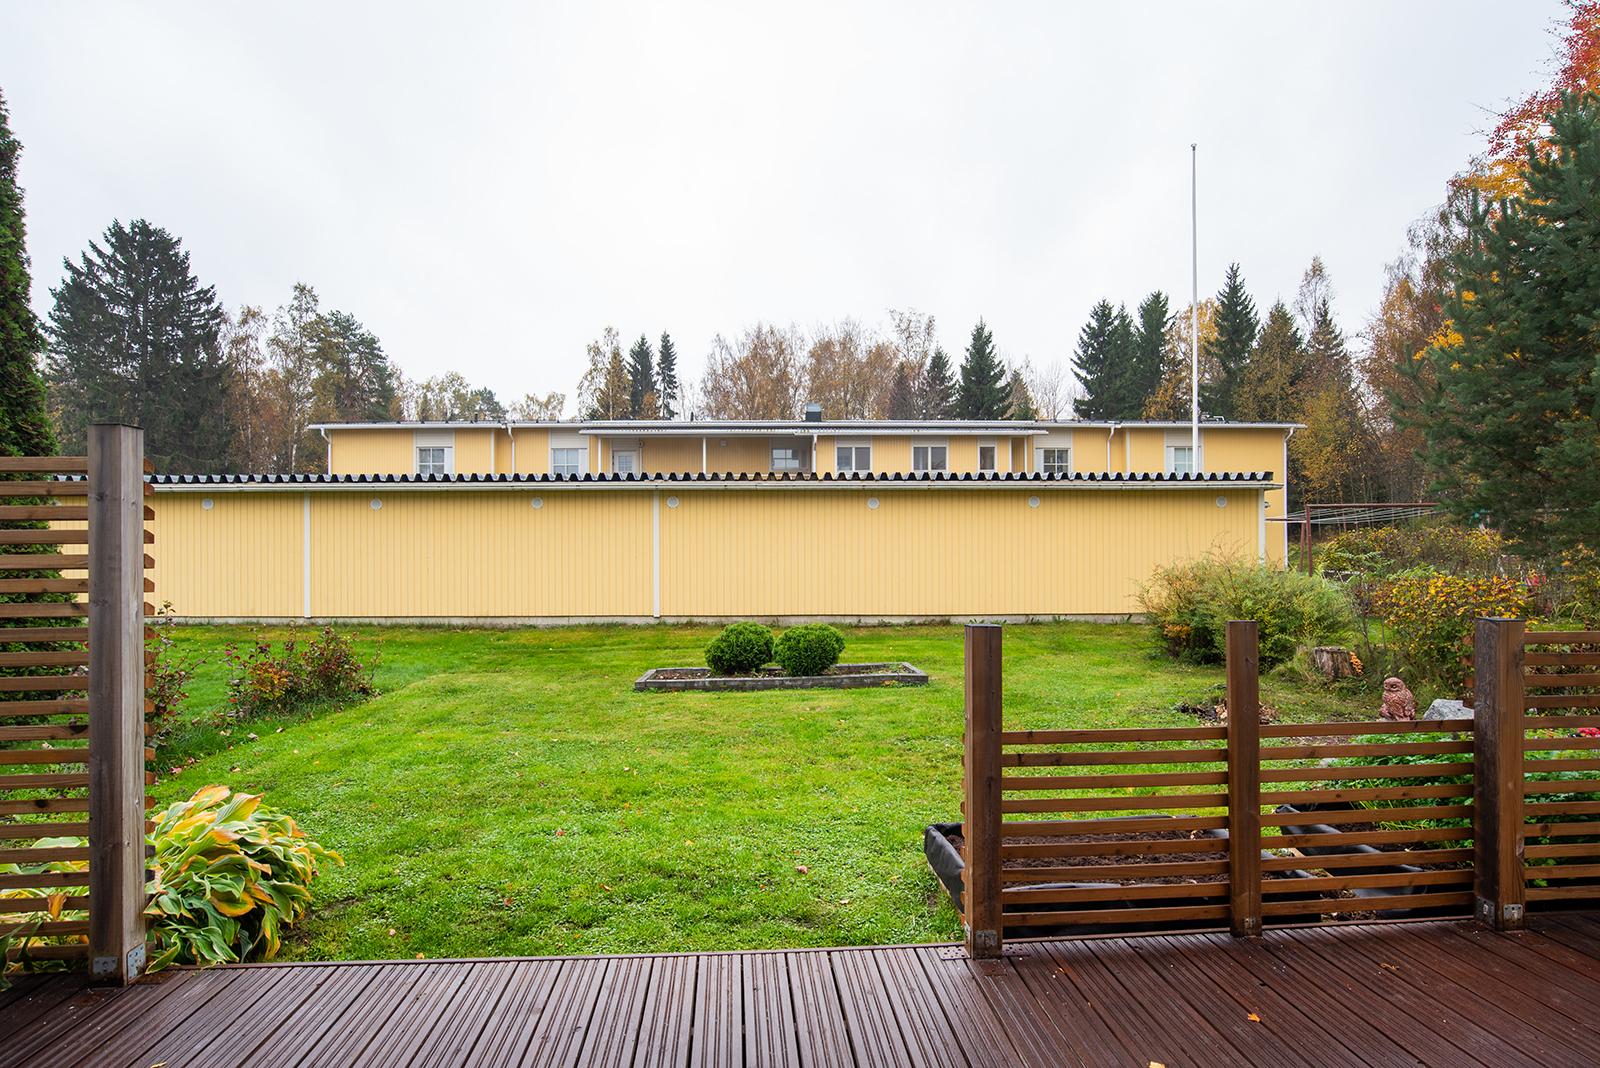 Pihassa on sekä leveyttä että pituutta/ Finns både brädd och djuphet i gården.